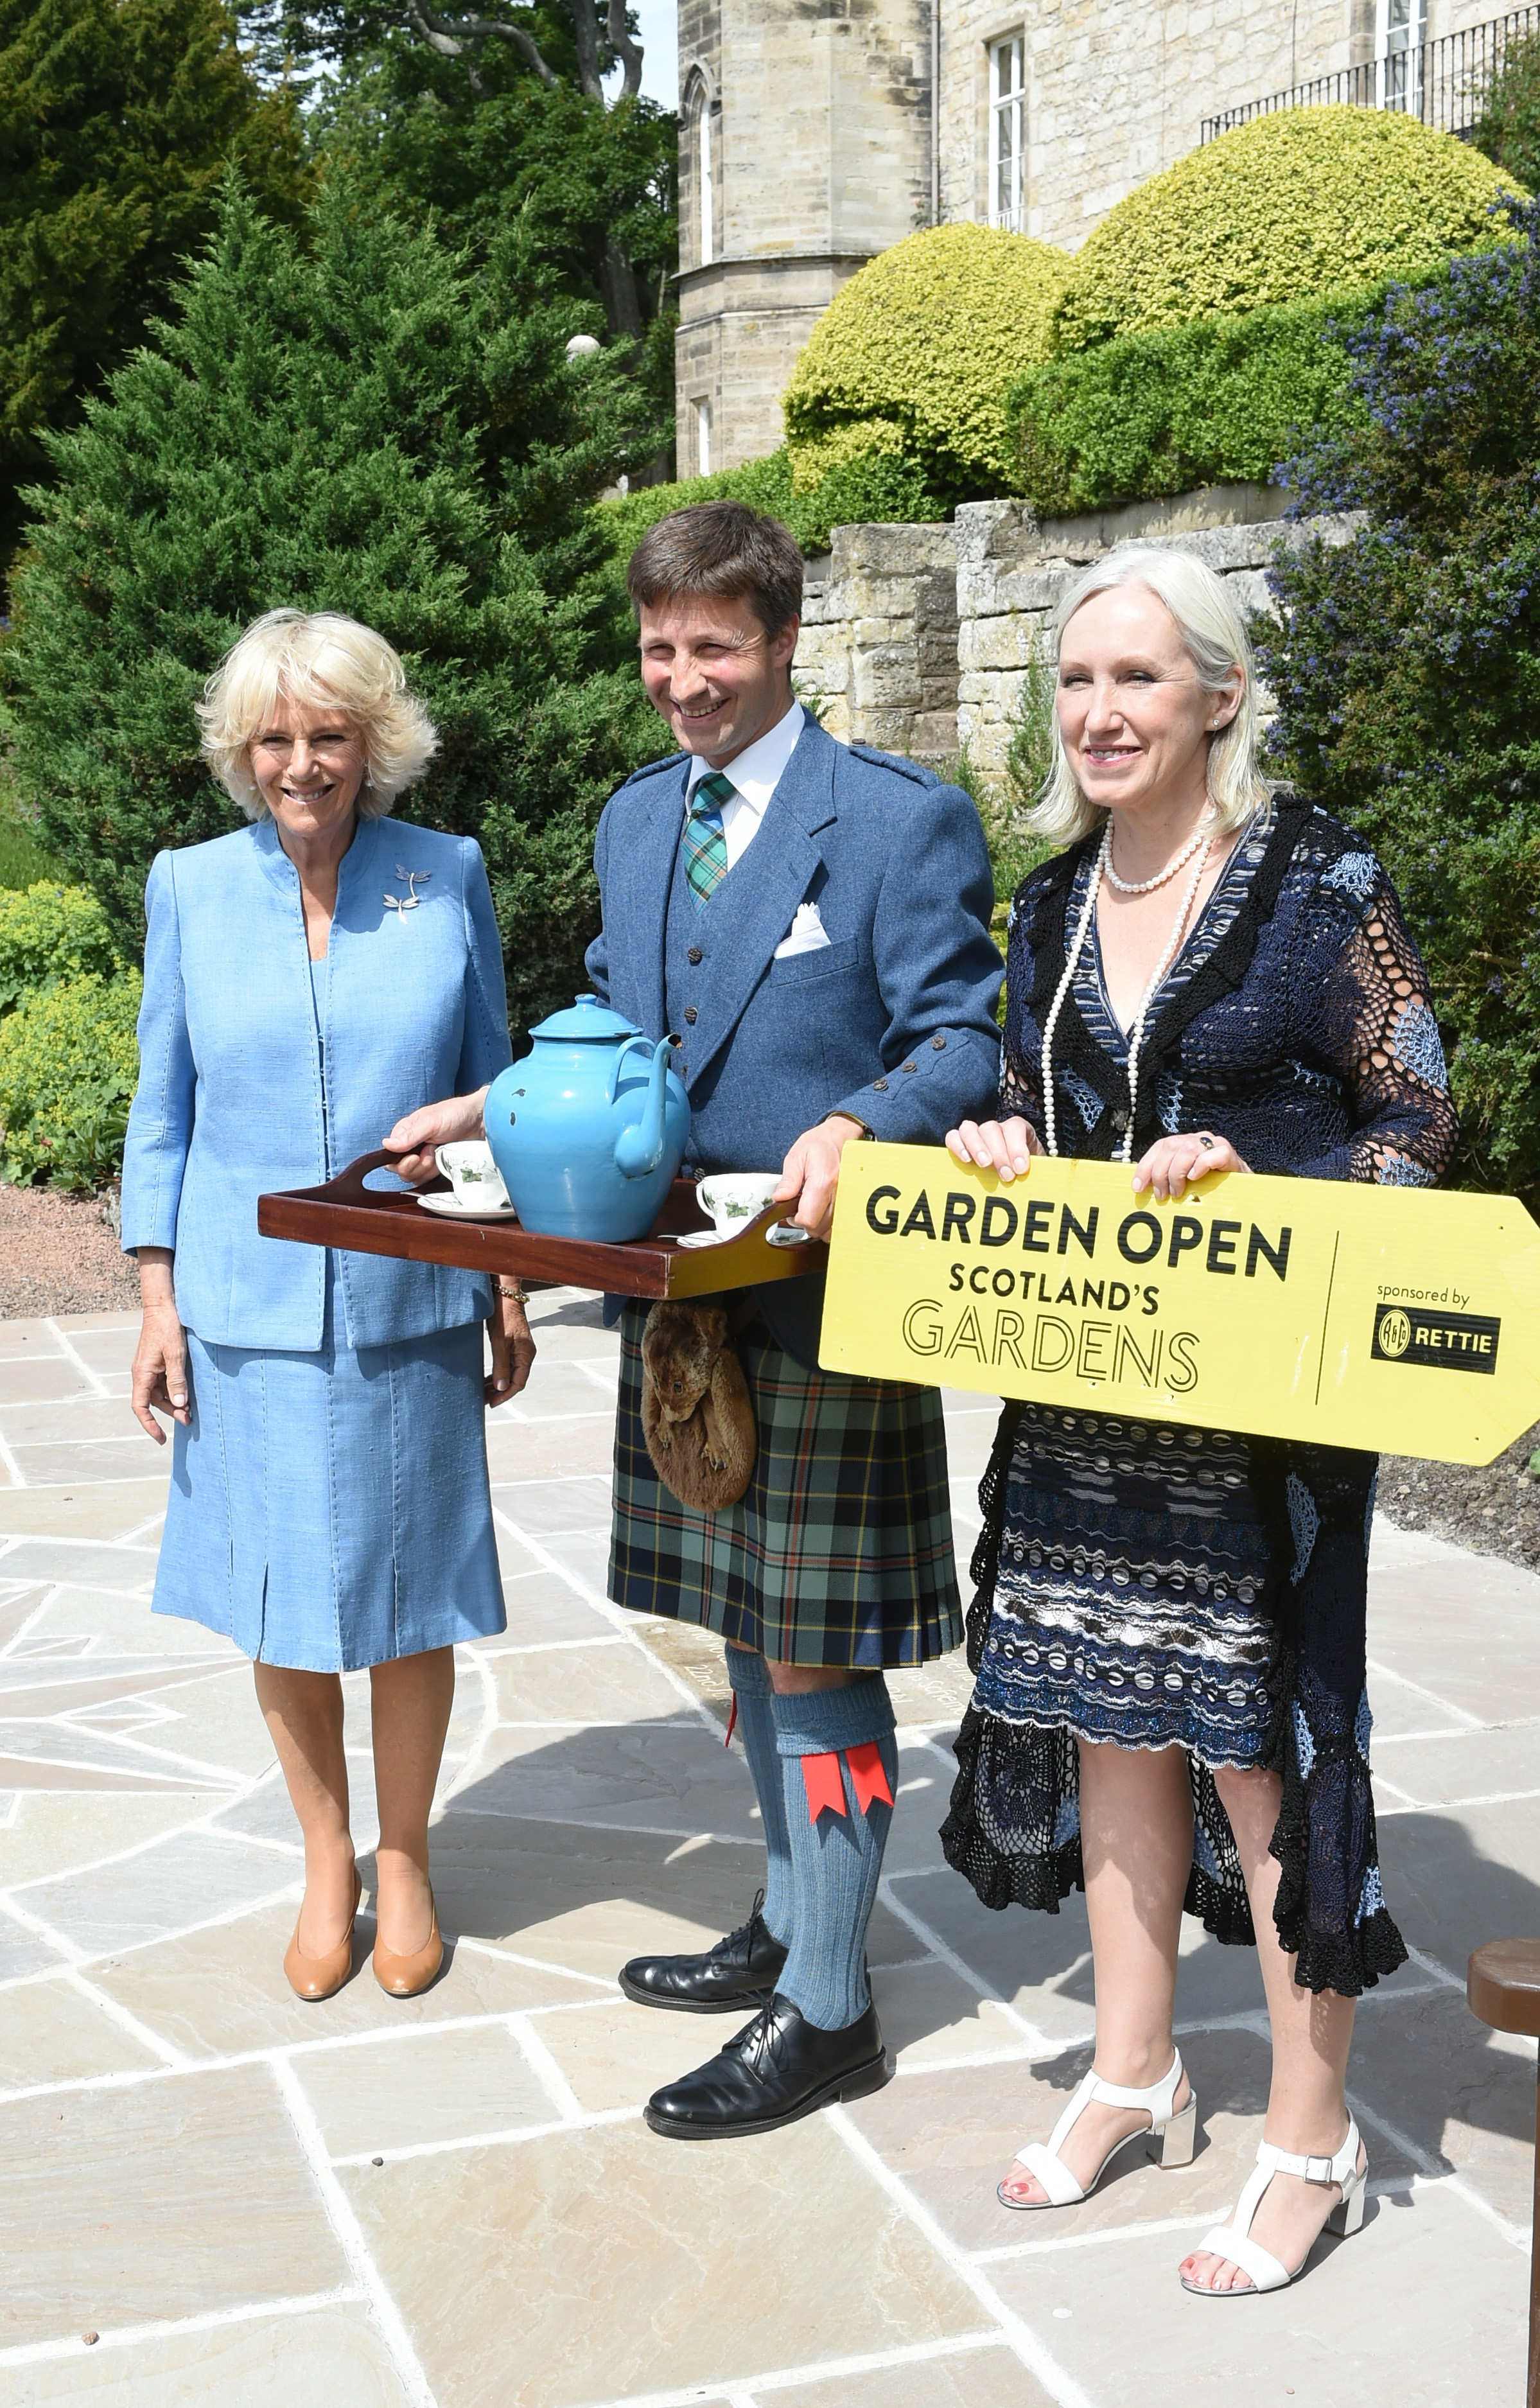 Scottish Gardens Scheme Garden Party 2016_Winton Castle_HRH Duchess of Rothesay_Francis Ogilvy_Terrill Dobson from Scotlands Gardens19